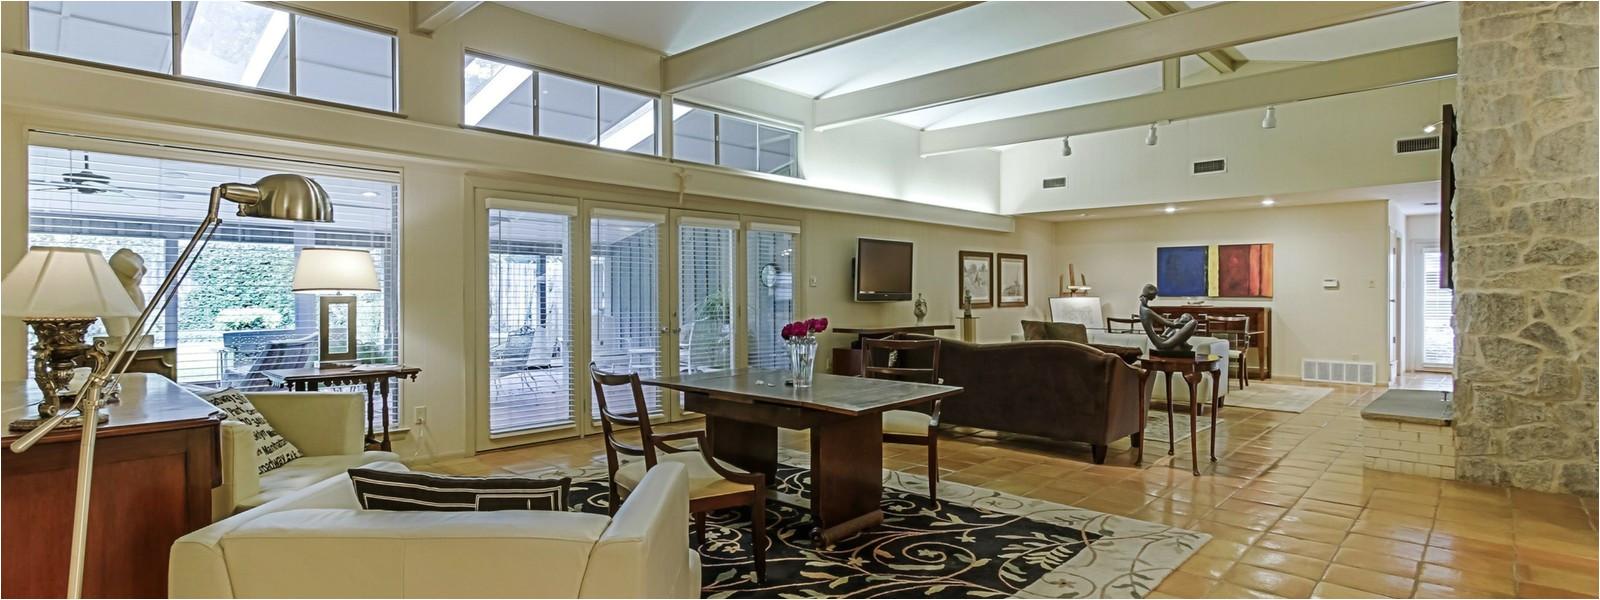 oak creek homes abilene luxury grand prairie 200k 350k texas lone star realtors of